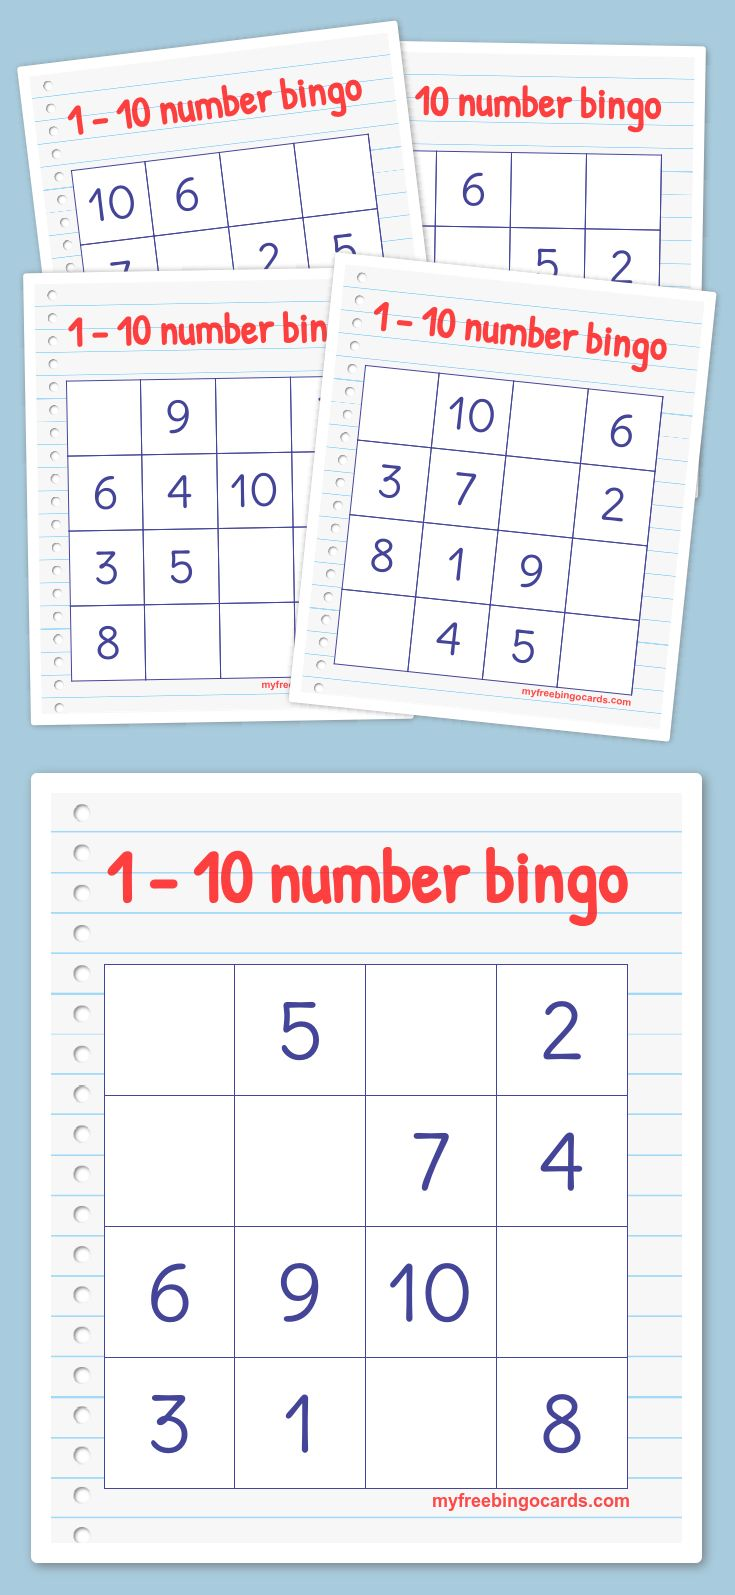 making bingo cards online